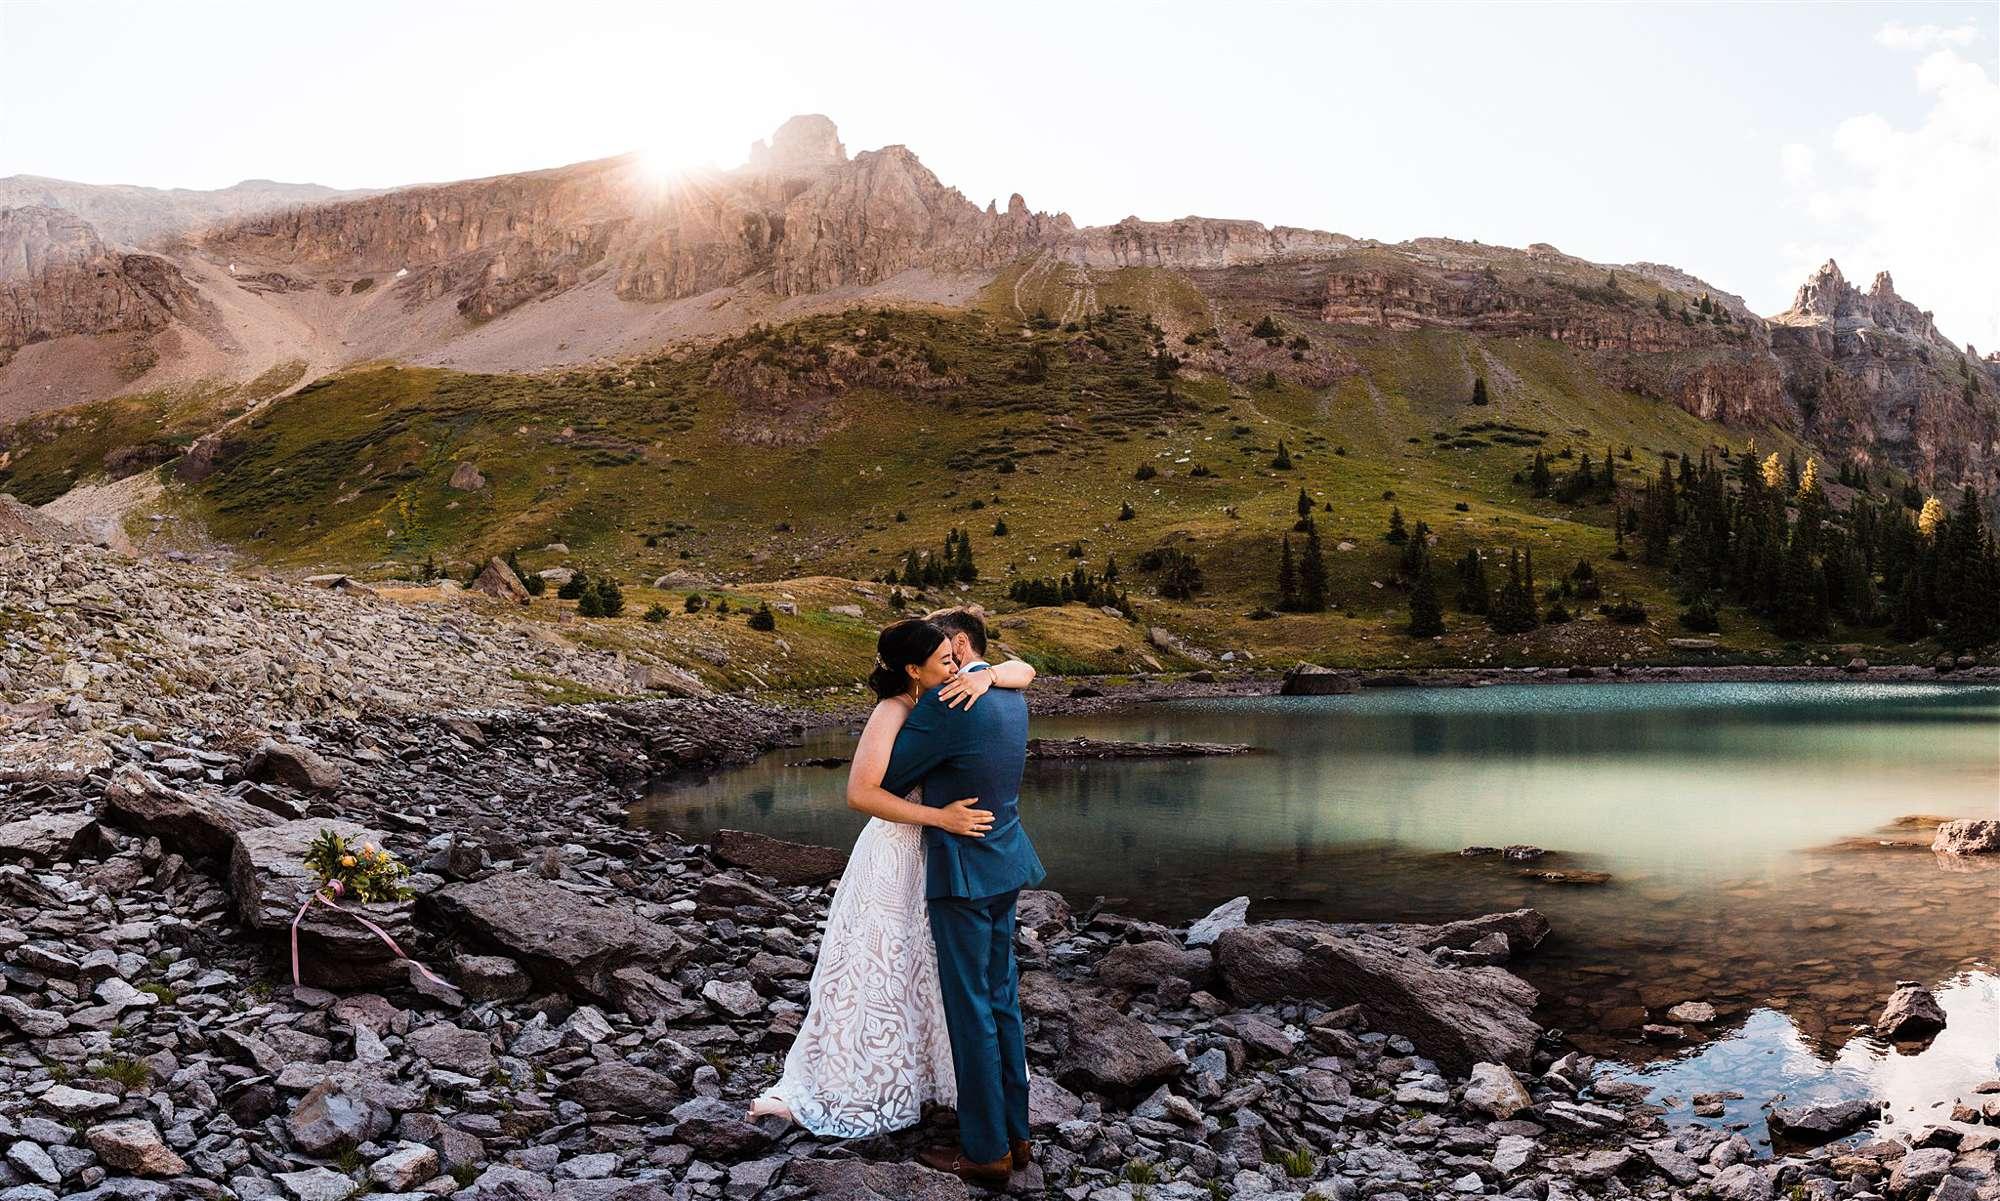 Colorado_Jeeping_Elopement_Emily_Matt_The_Foxes_Photography_0034.jpg